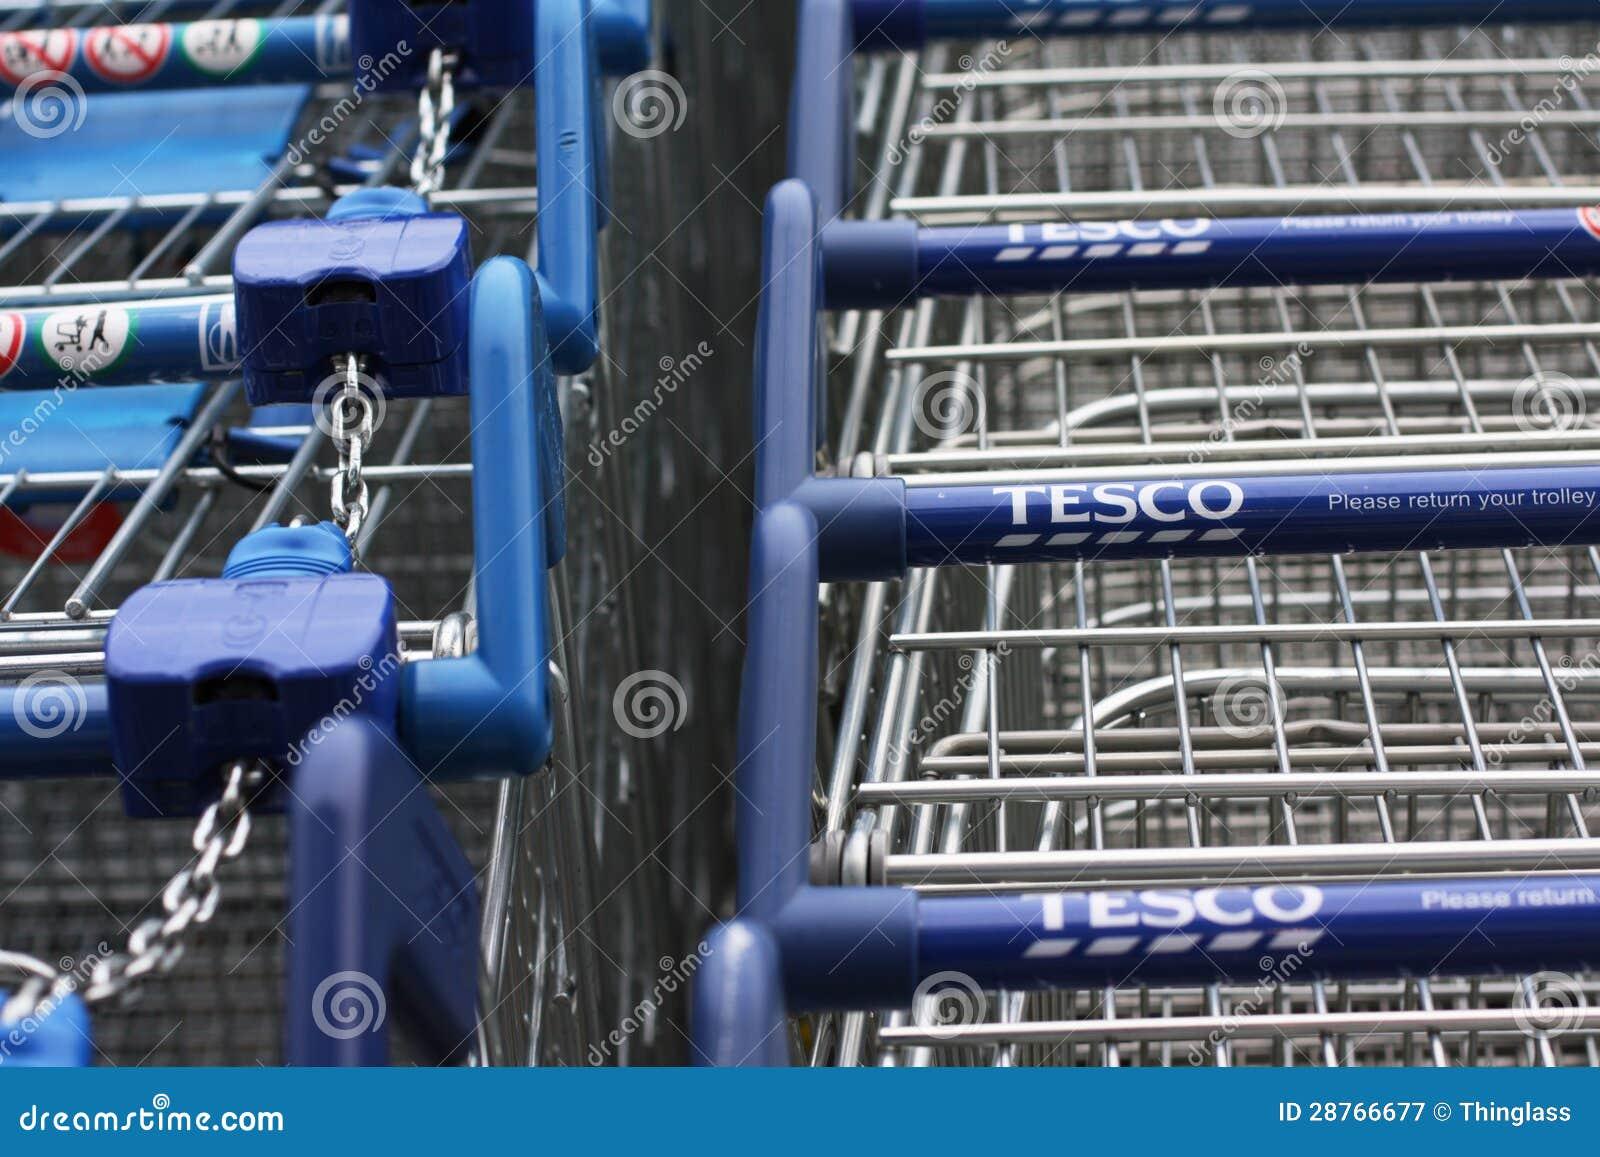 Tesco shoppingvagnar